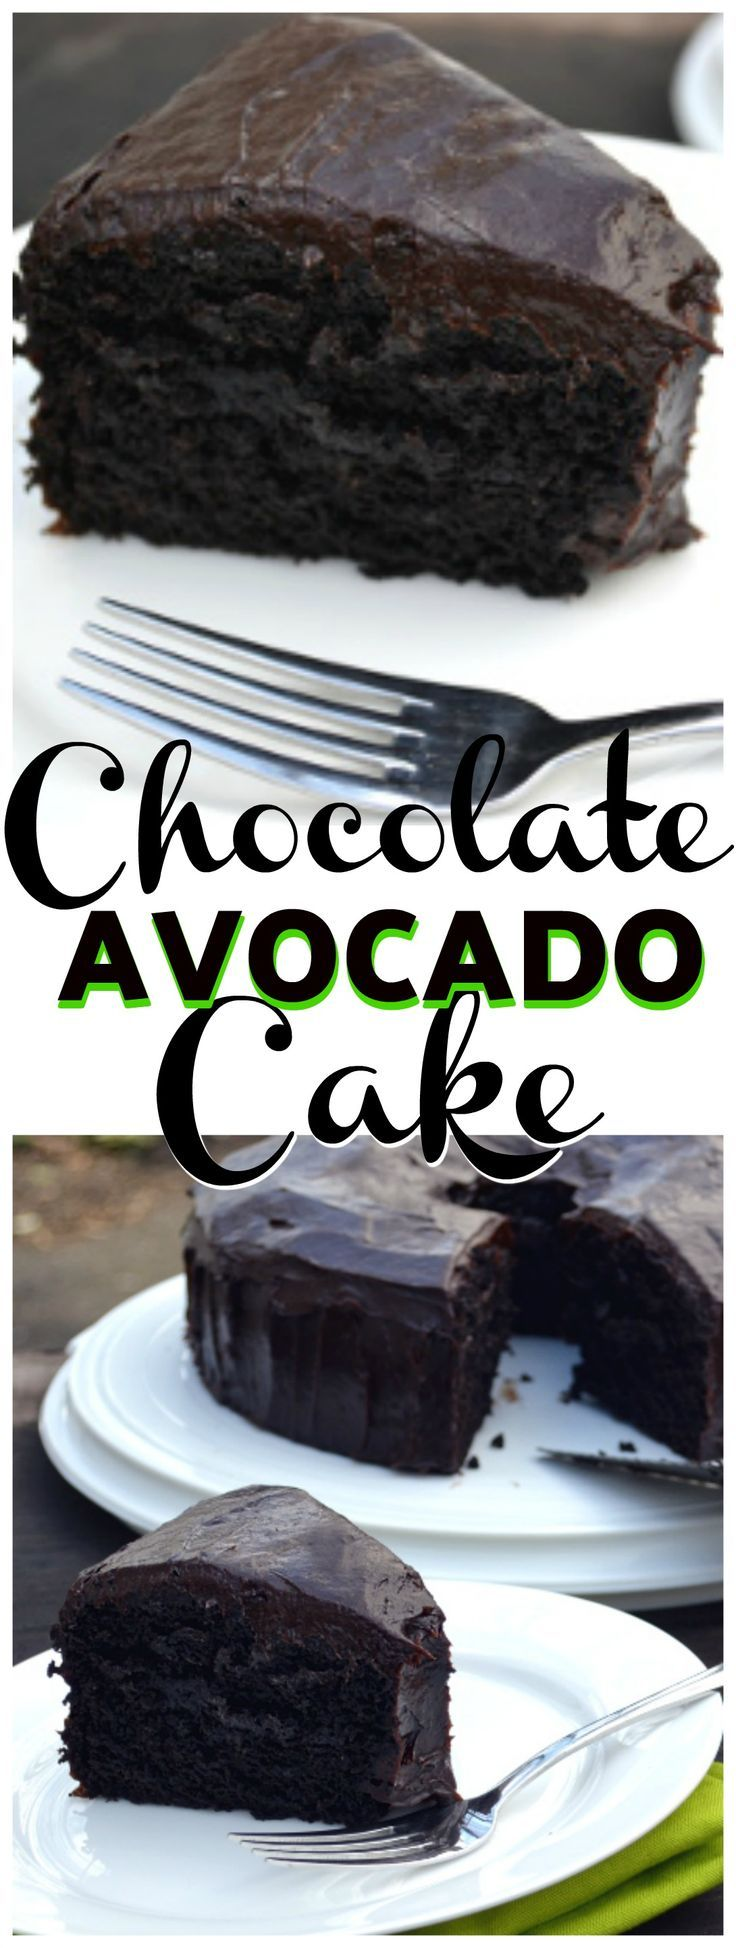 Chocolate Avocado Cake With Chocolate Avocado Frosting Recipe